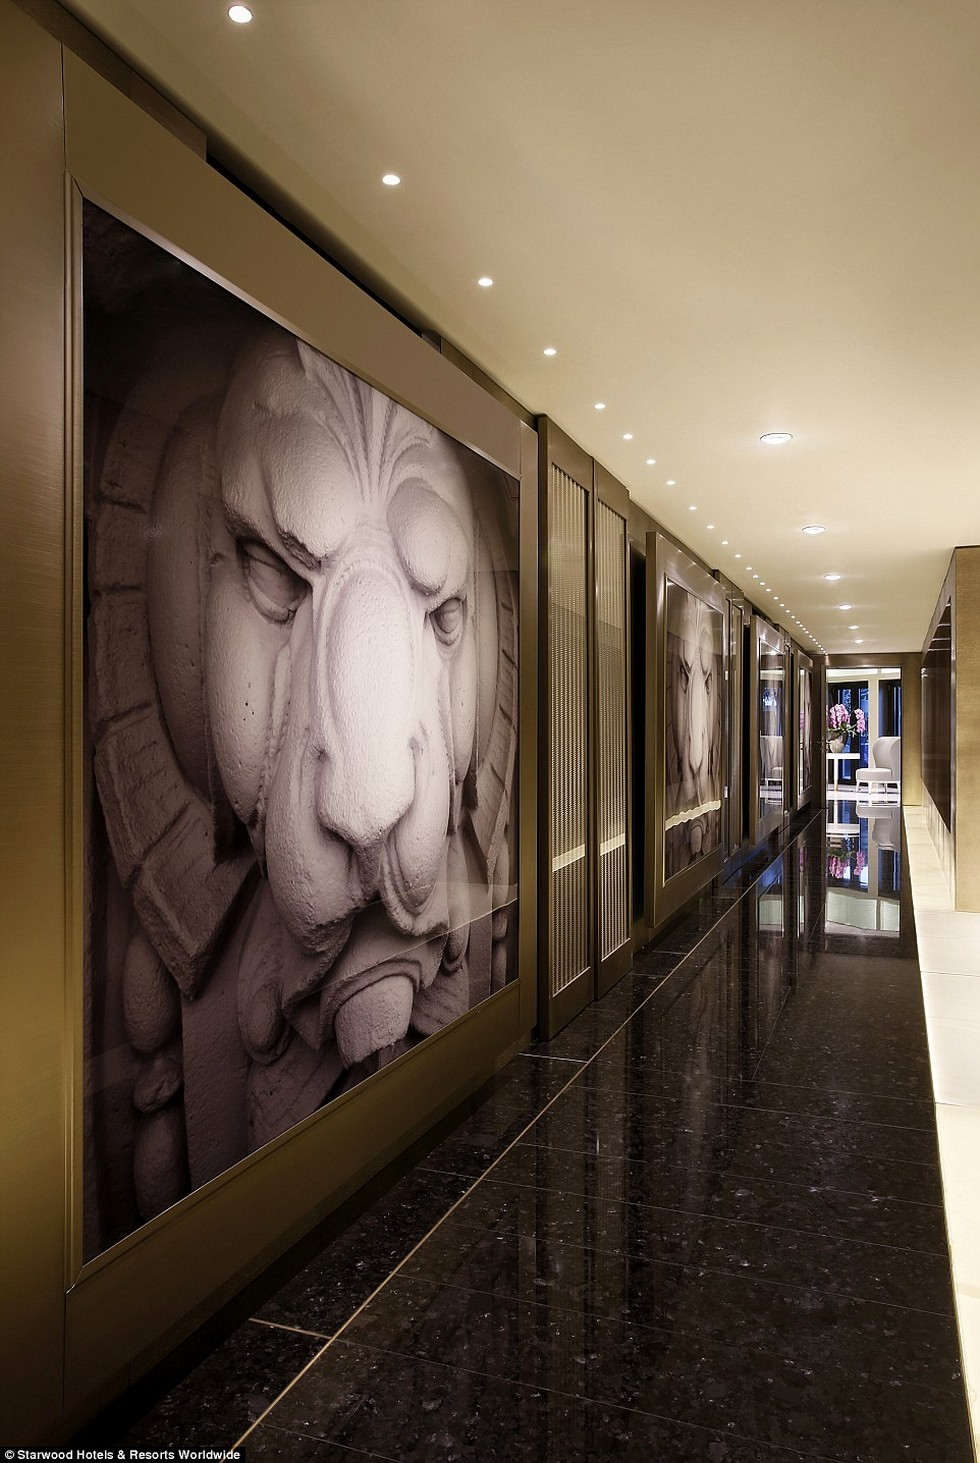 Milan Hotels Excelsior's Katara Suite awarded as world best suite (1)